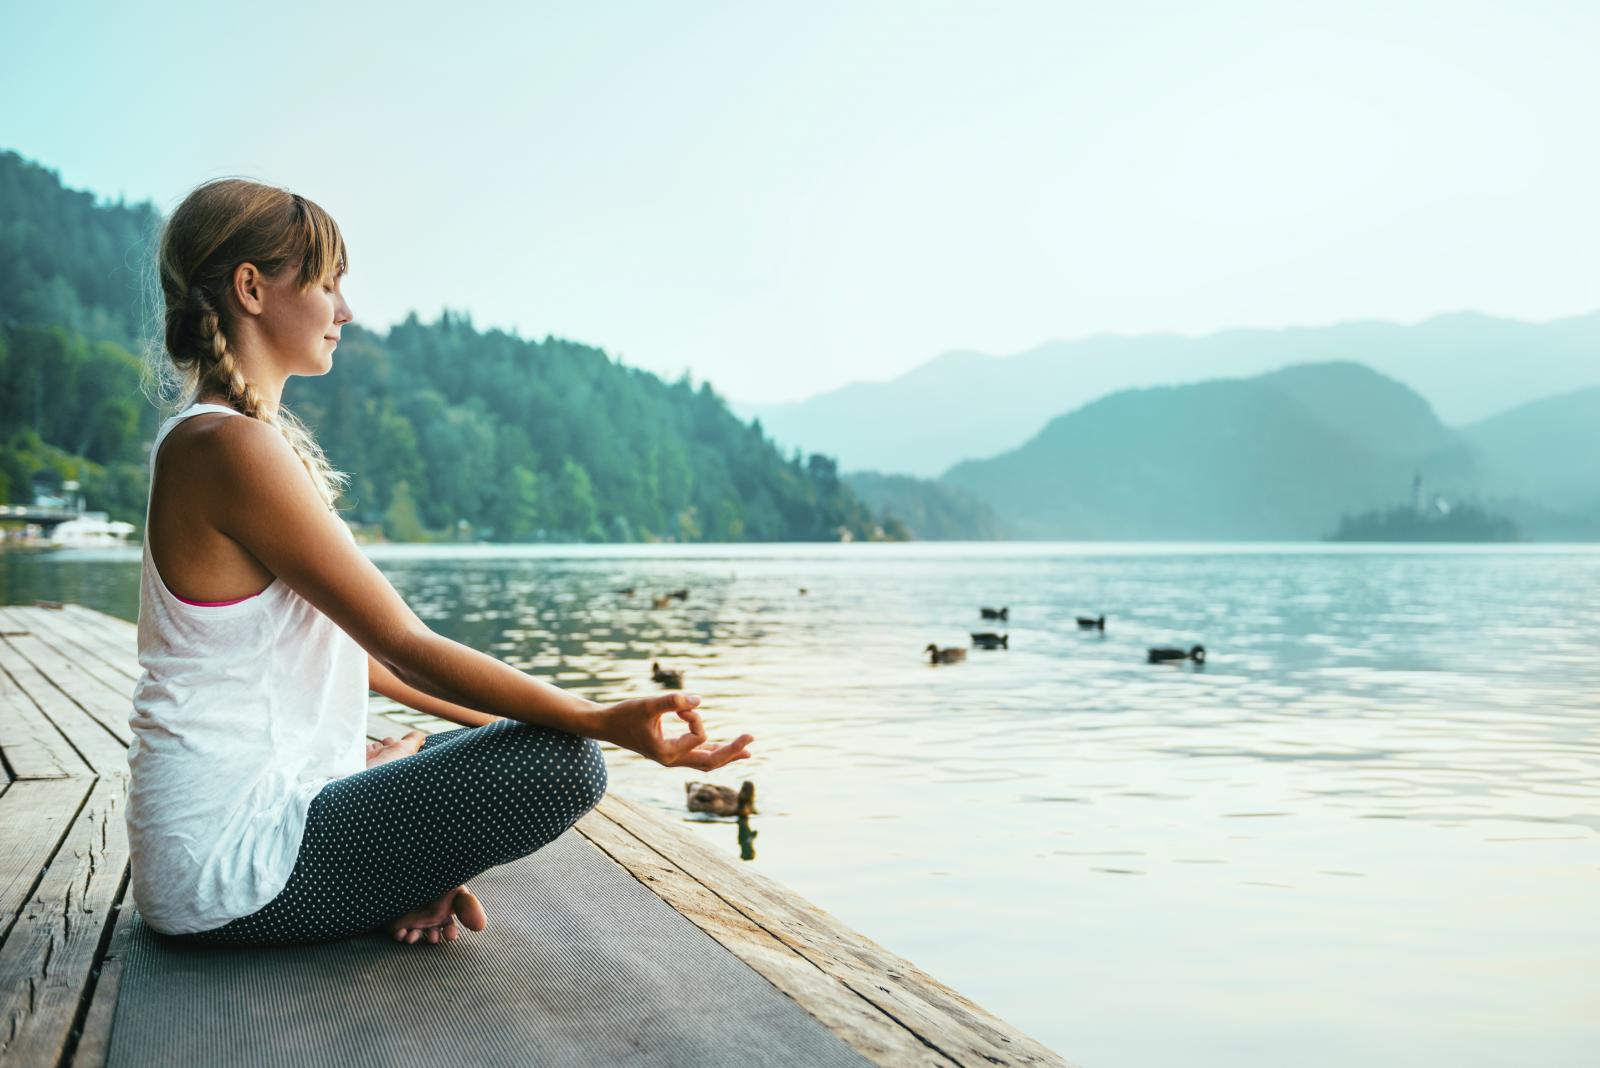 dr. Sanja Toljan savjetuje kako upoznati svoje hormone i dovesti organizam u ravnotežu.